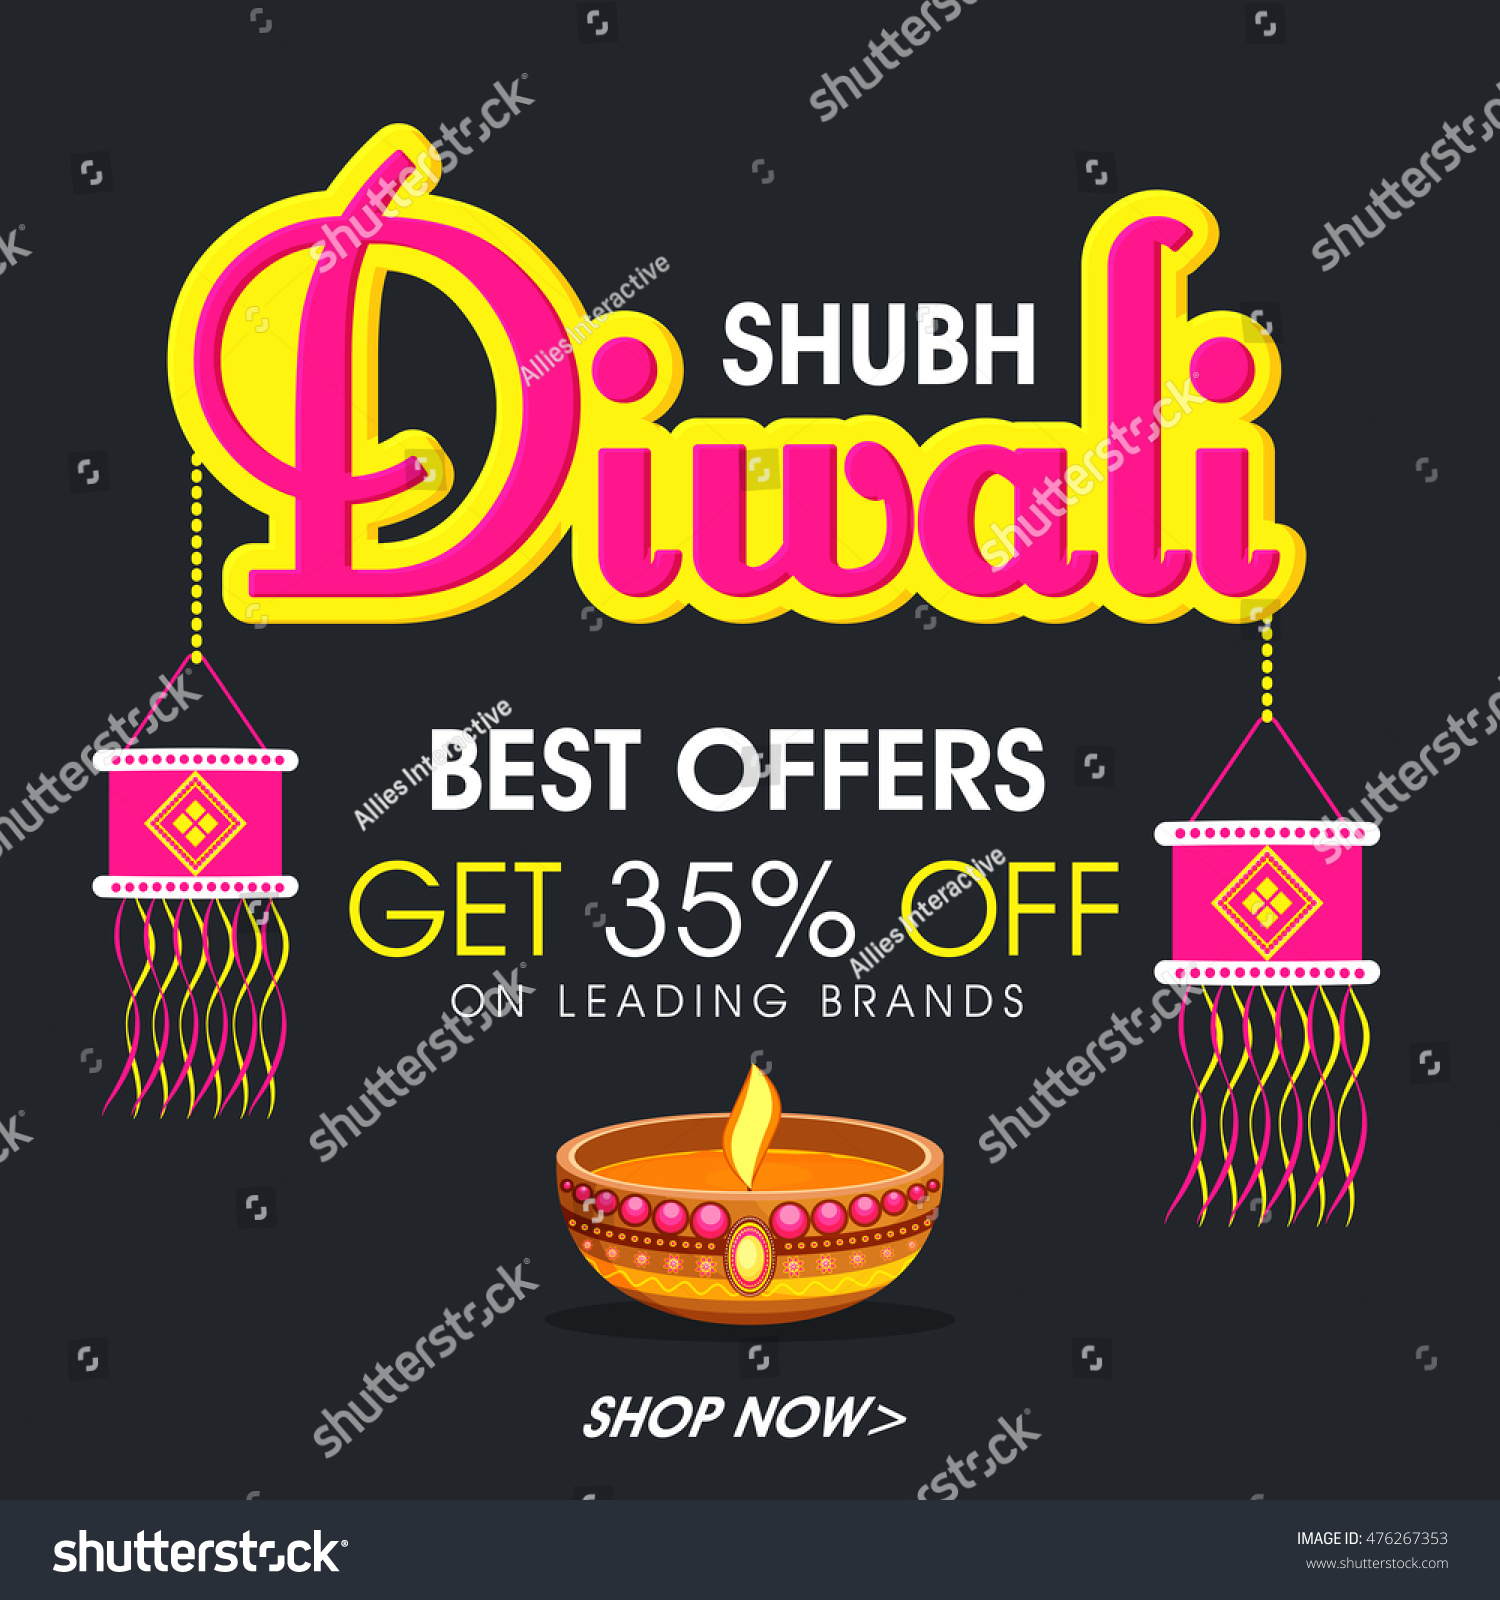 100 best photos of diwali happy deepavali festival